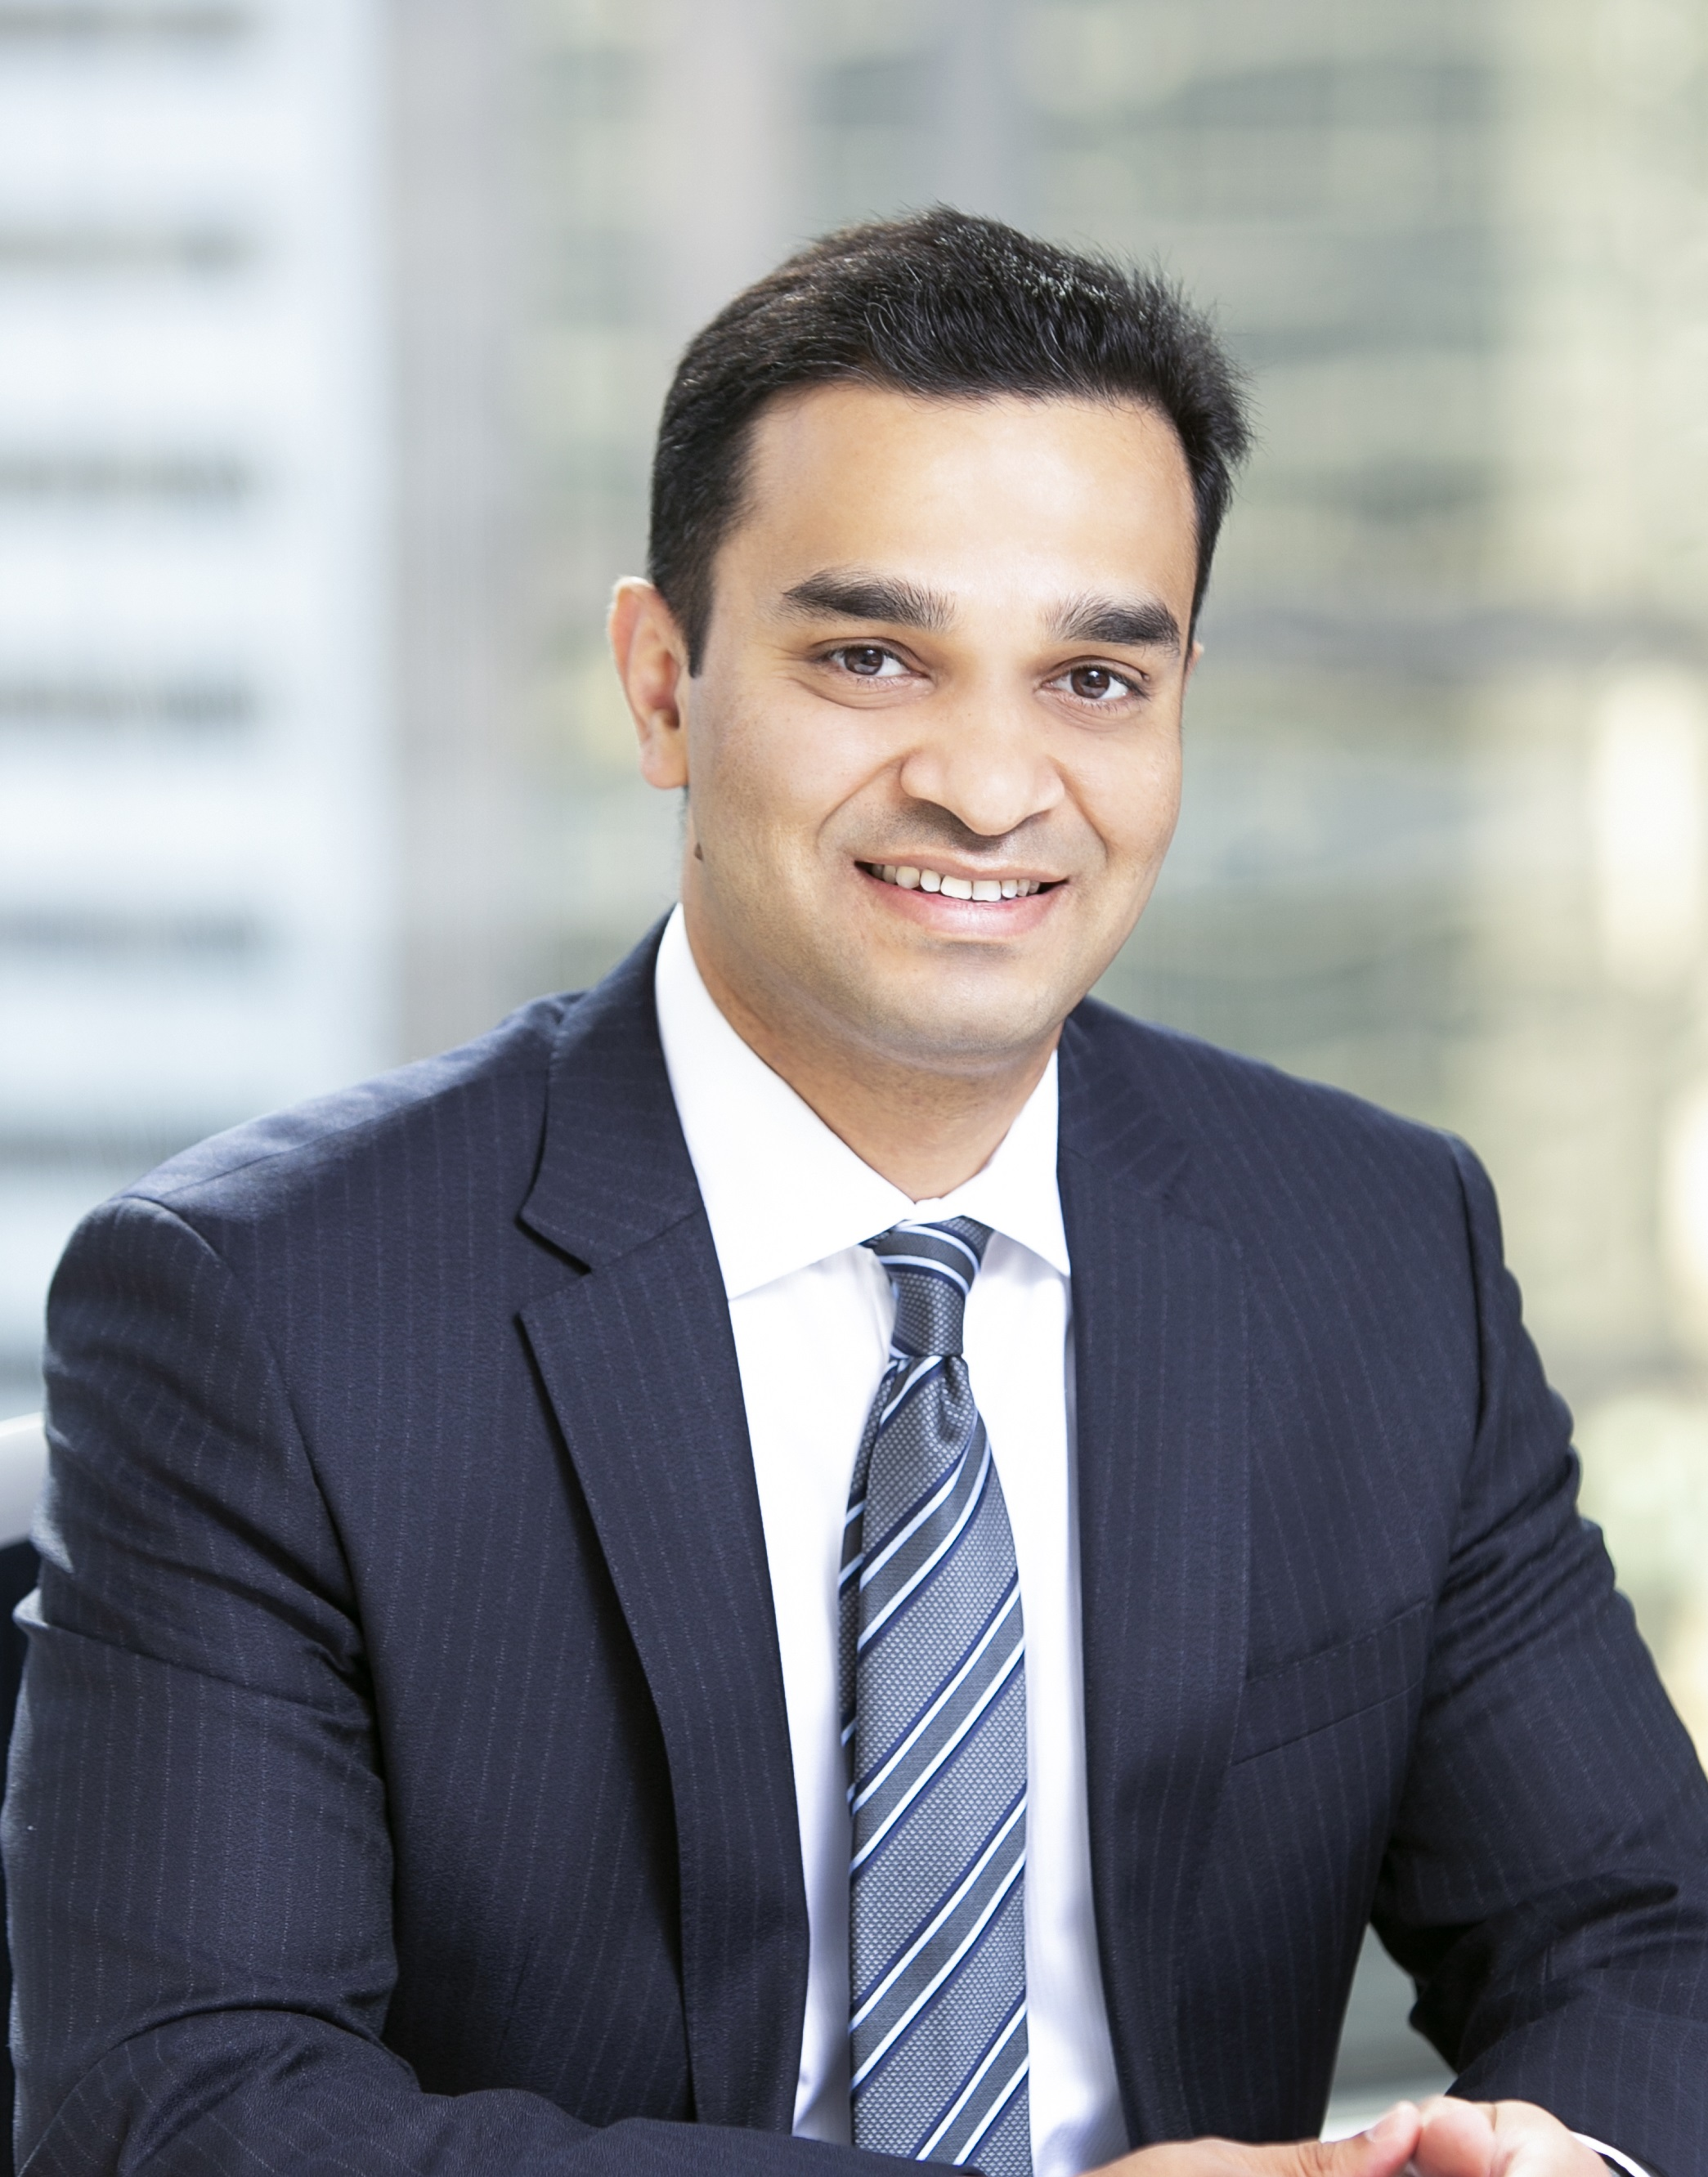 Krishna Gadhraju, Home Trust Company/Home Bank